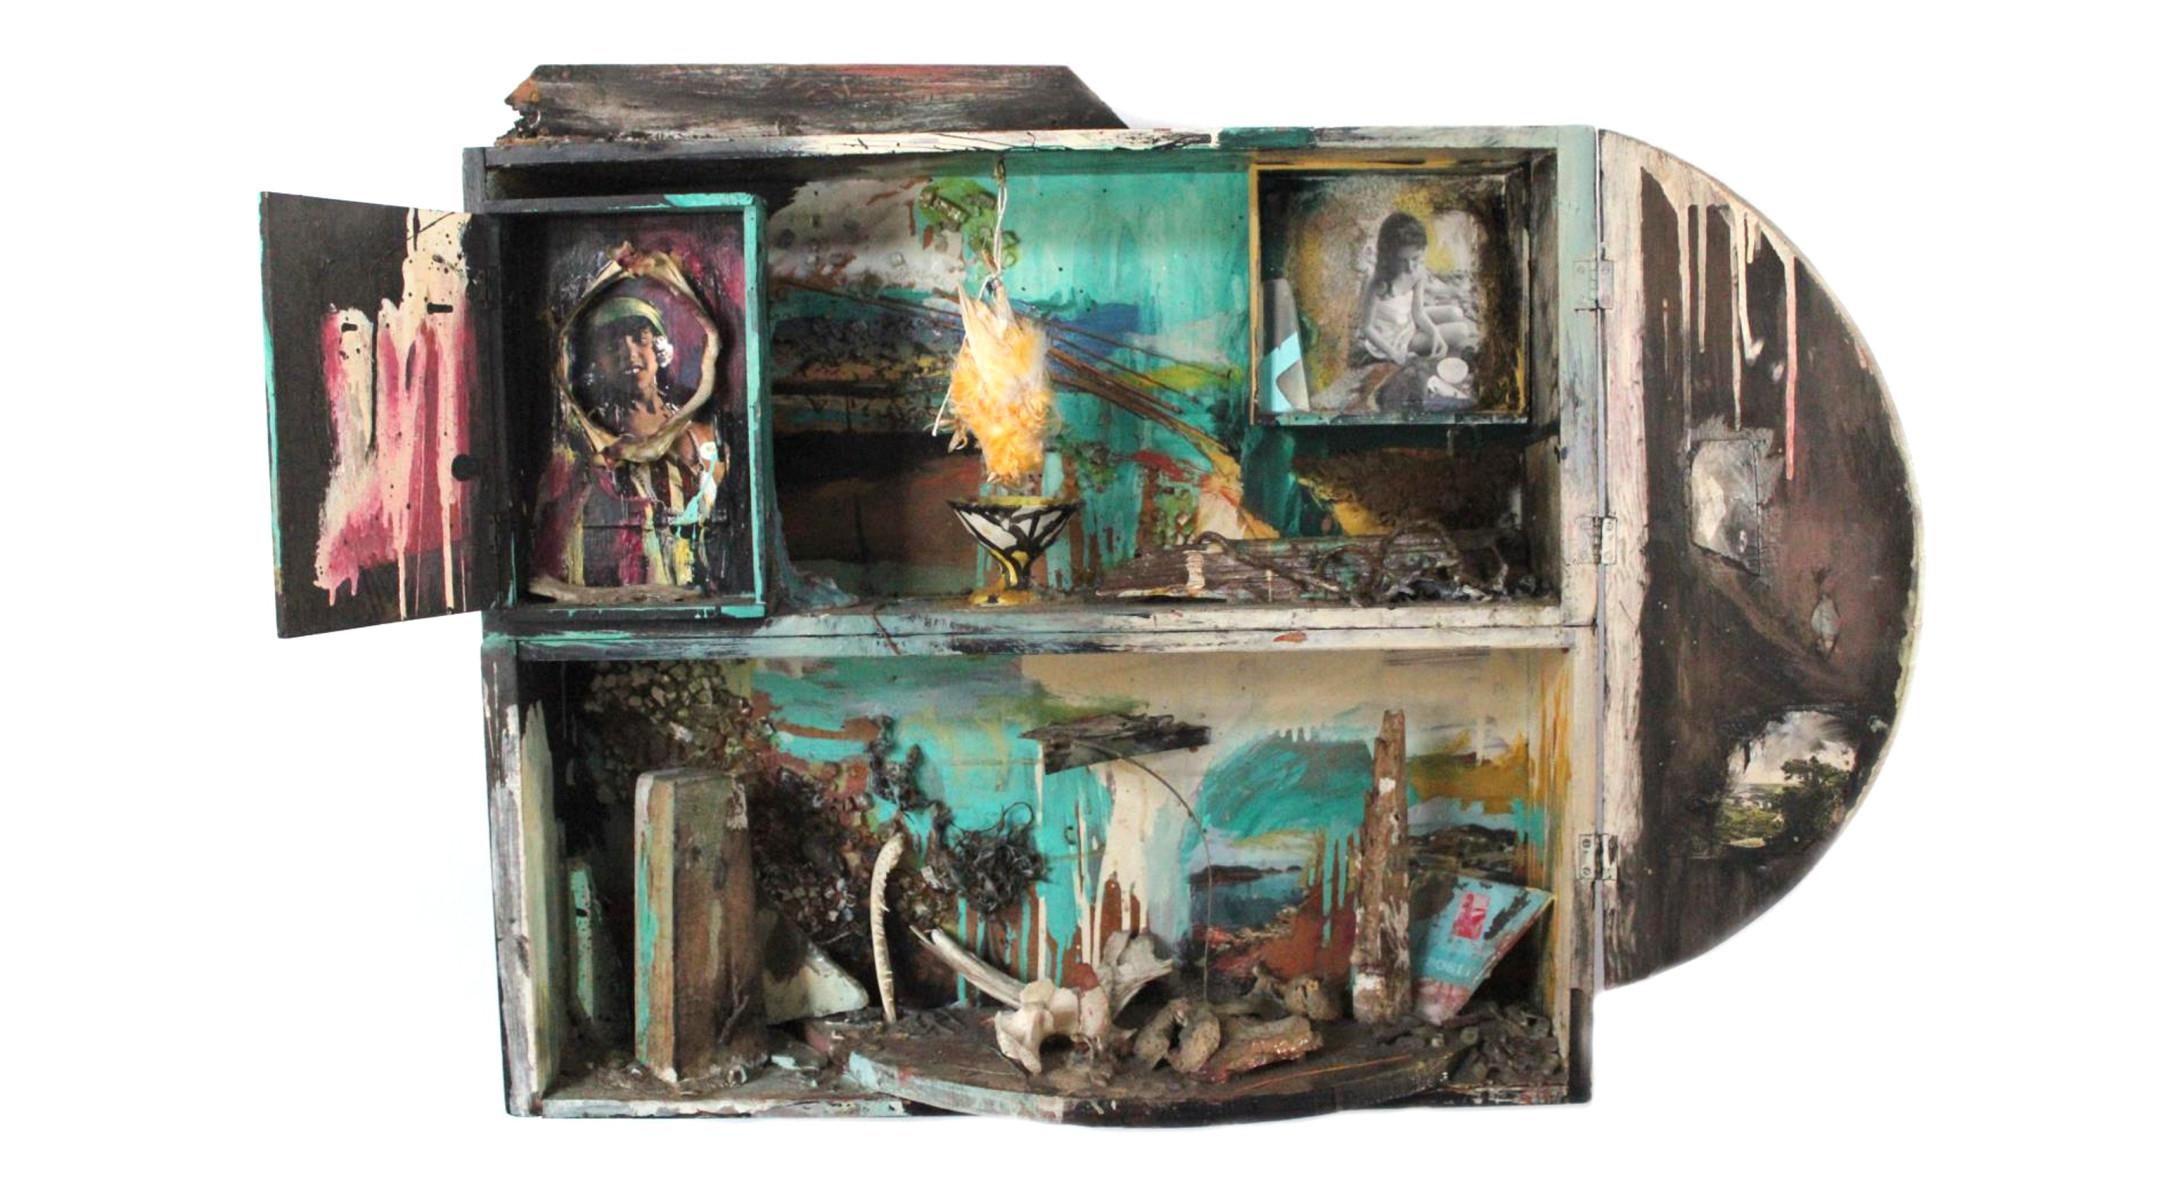 Carolee Schneemann, Native Beauties, 1963-1964, Wood, photographs, glass, bones, 104.1 x 66 x 14 cm, 41 x 26 x 5 1/2 in